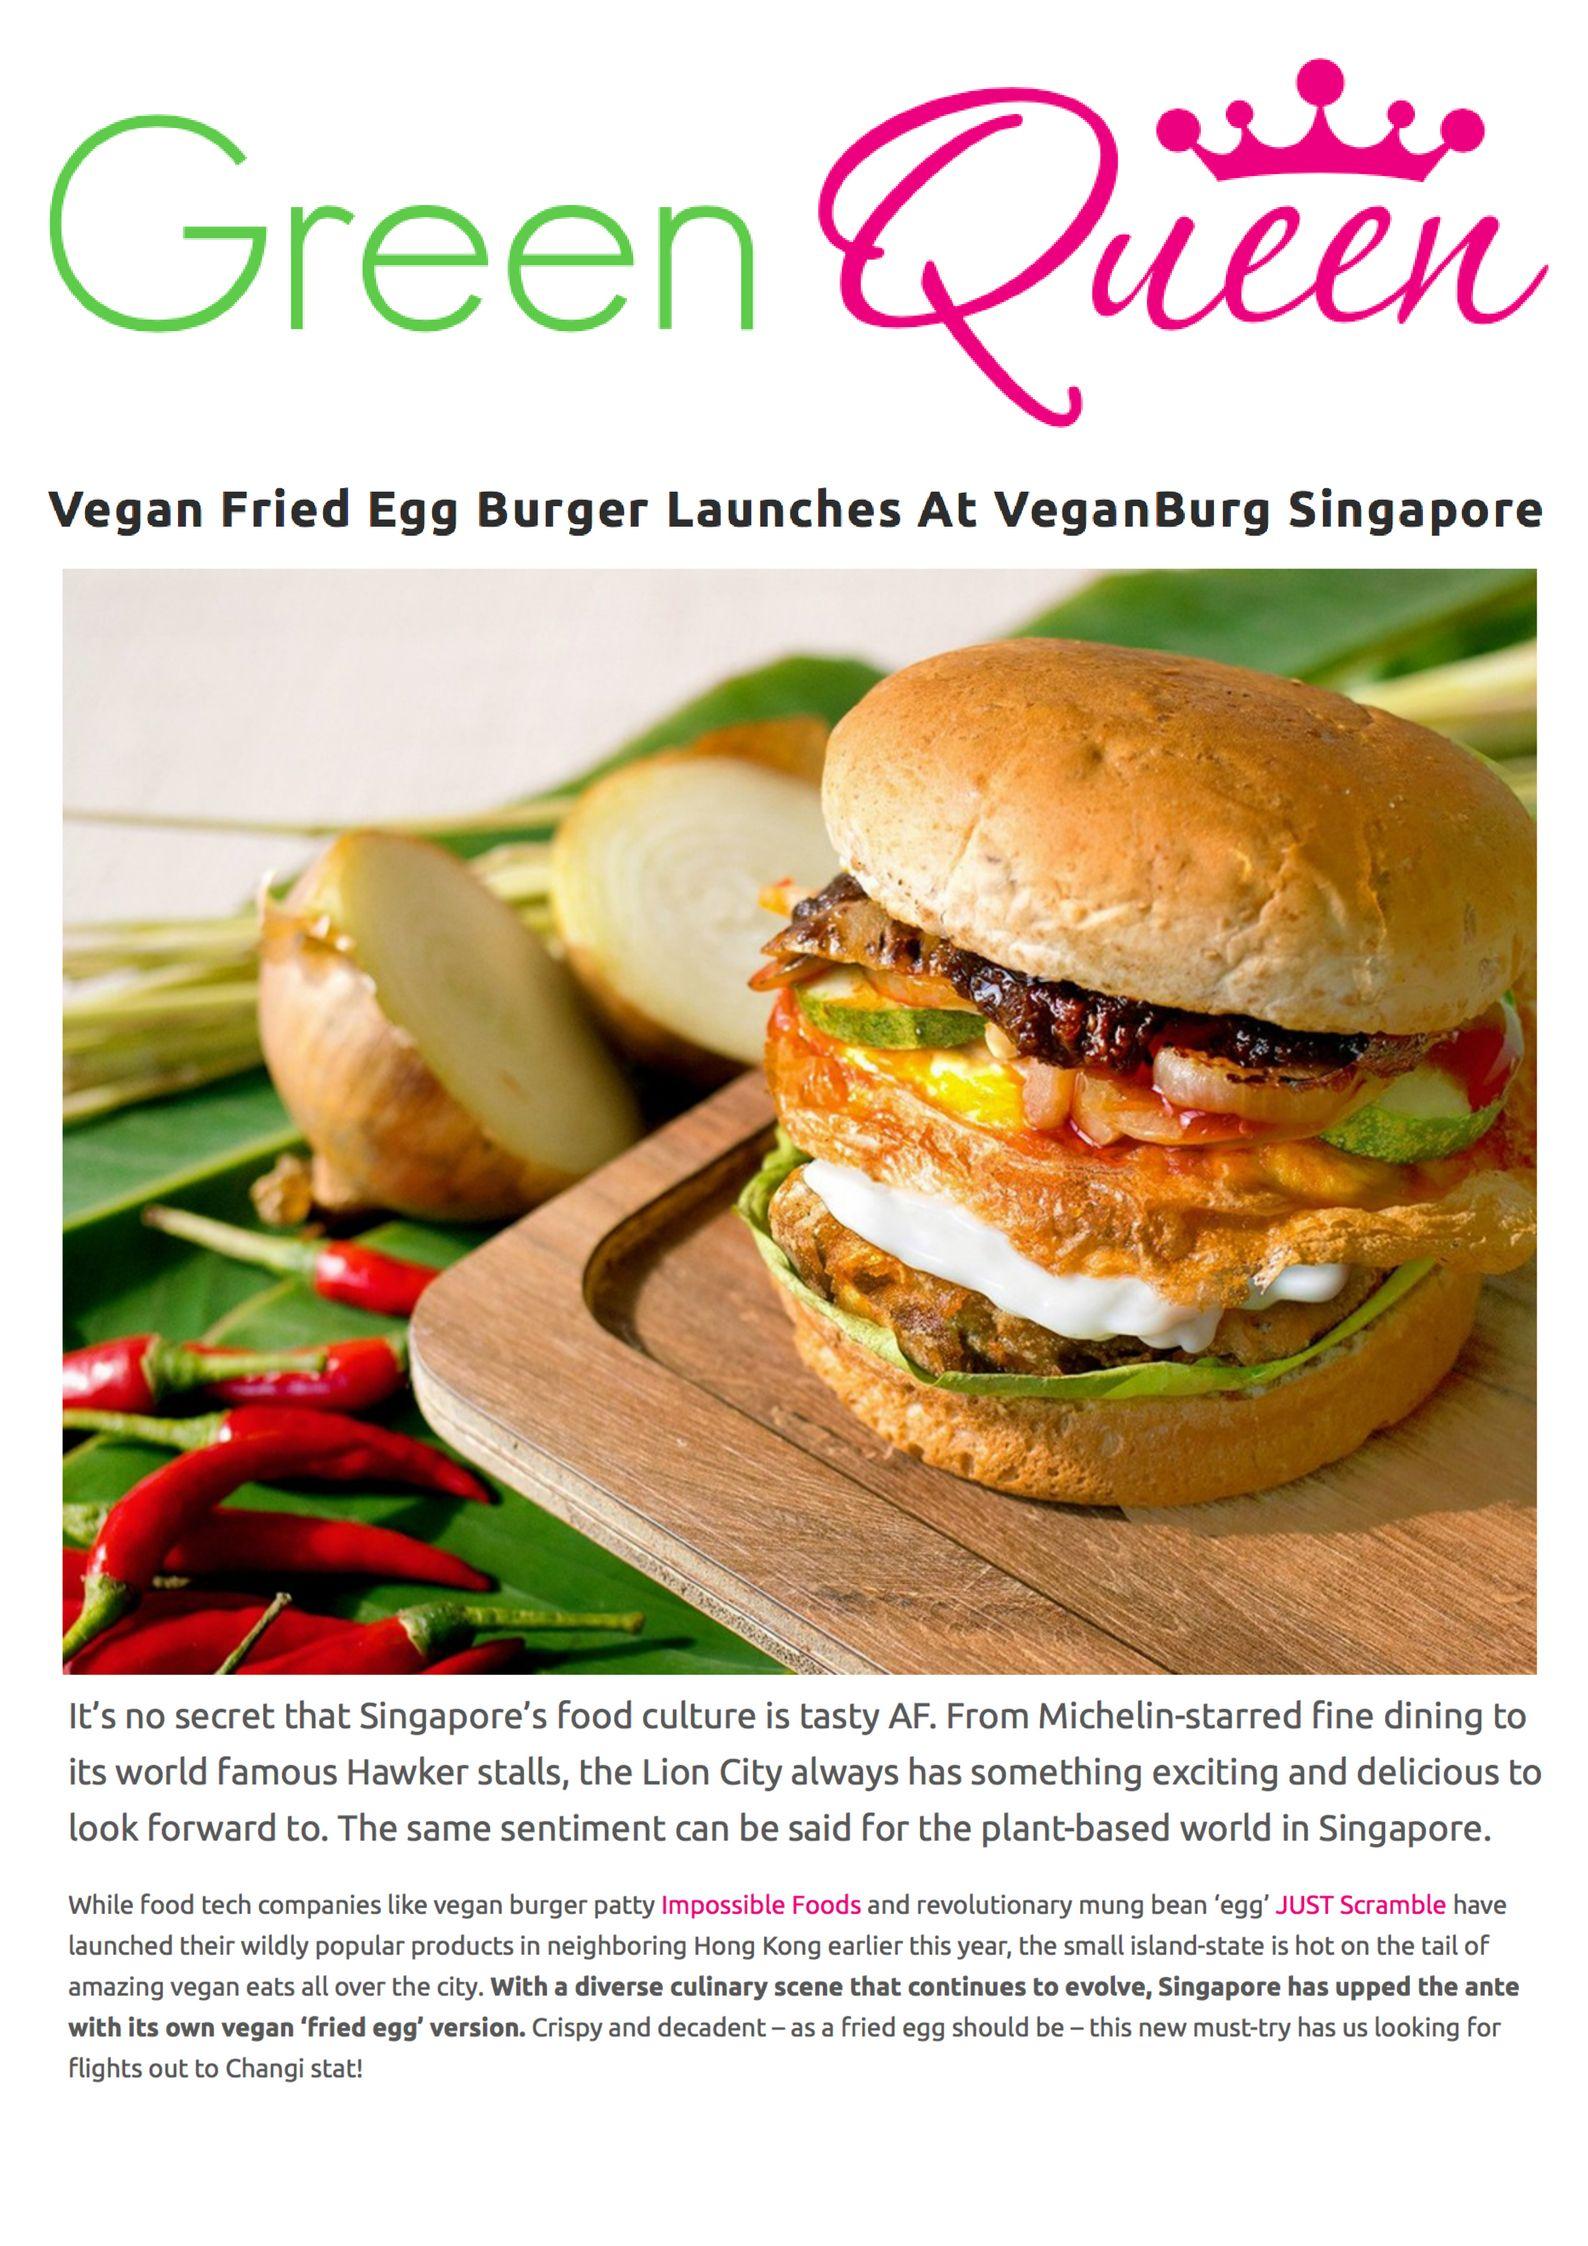 Green Queen _ Vegan Fried Egg Burger Launches At VeganBurg Singapore.jpg